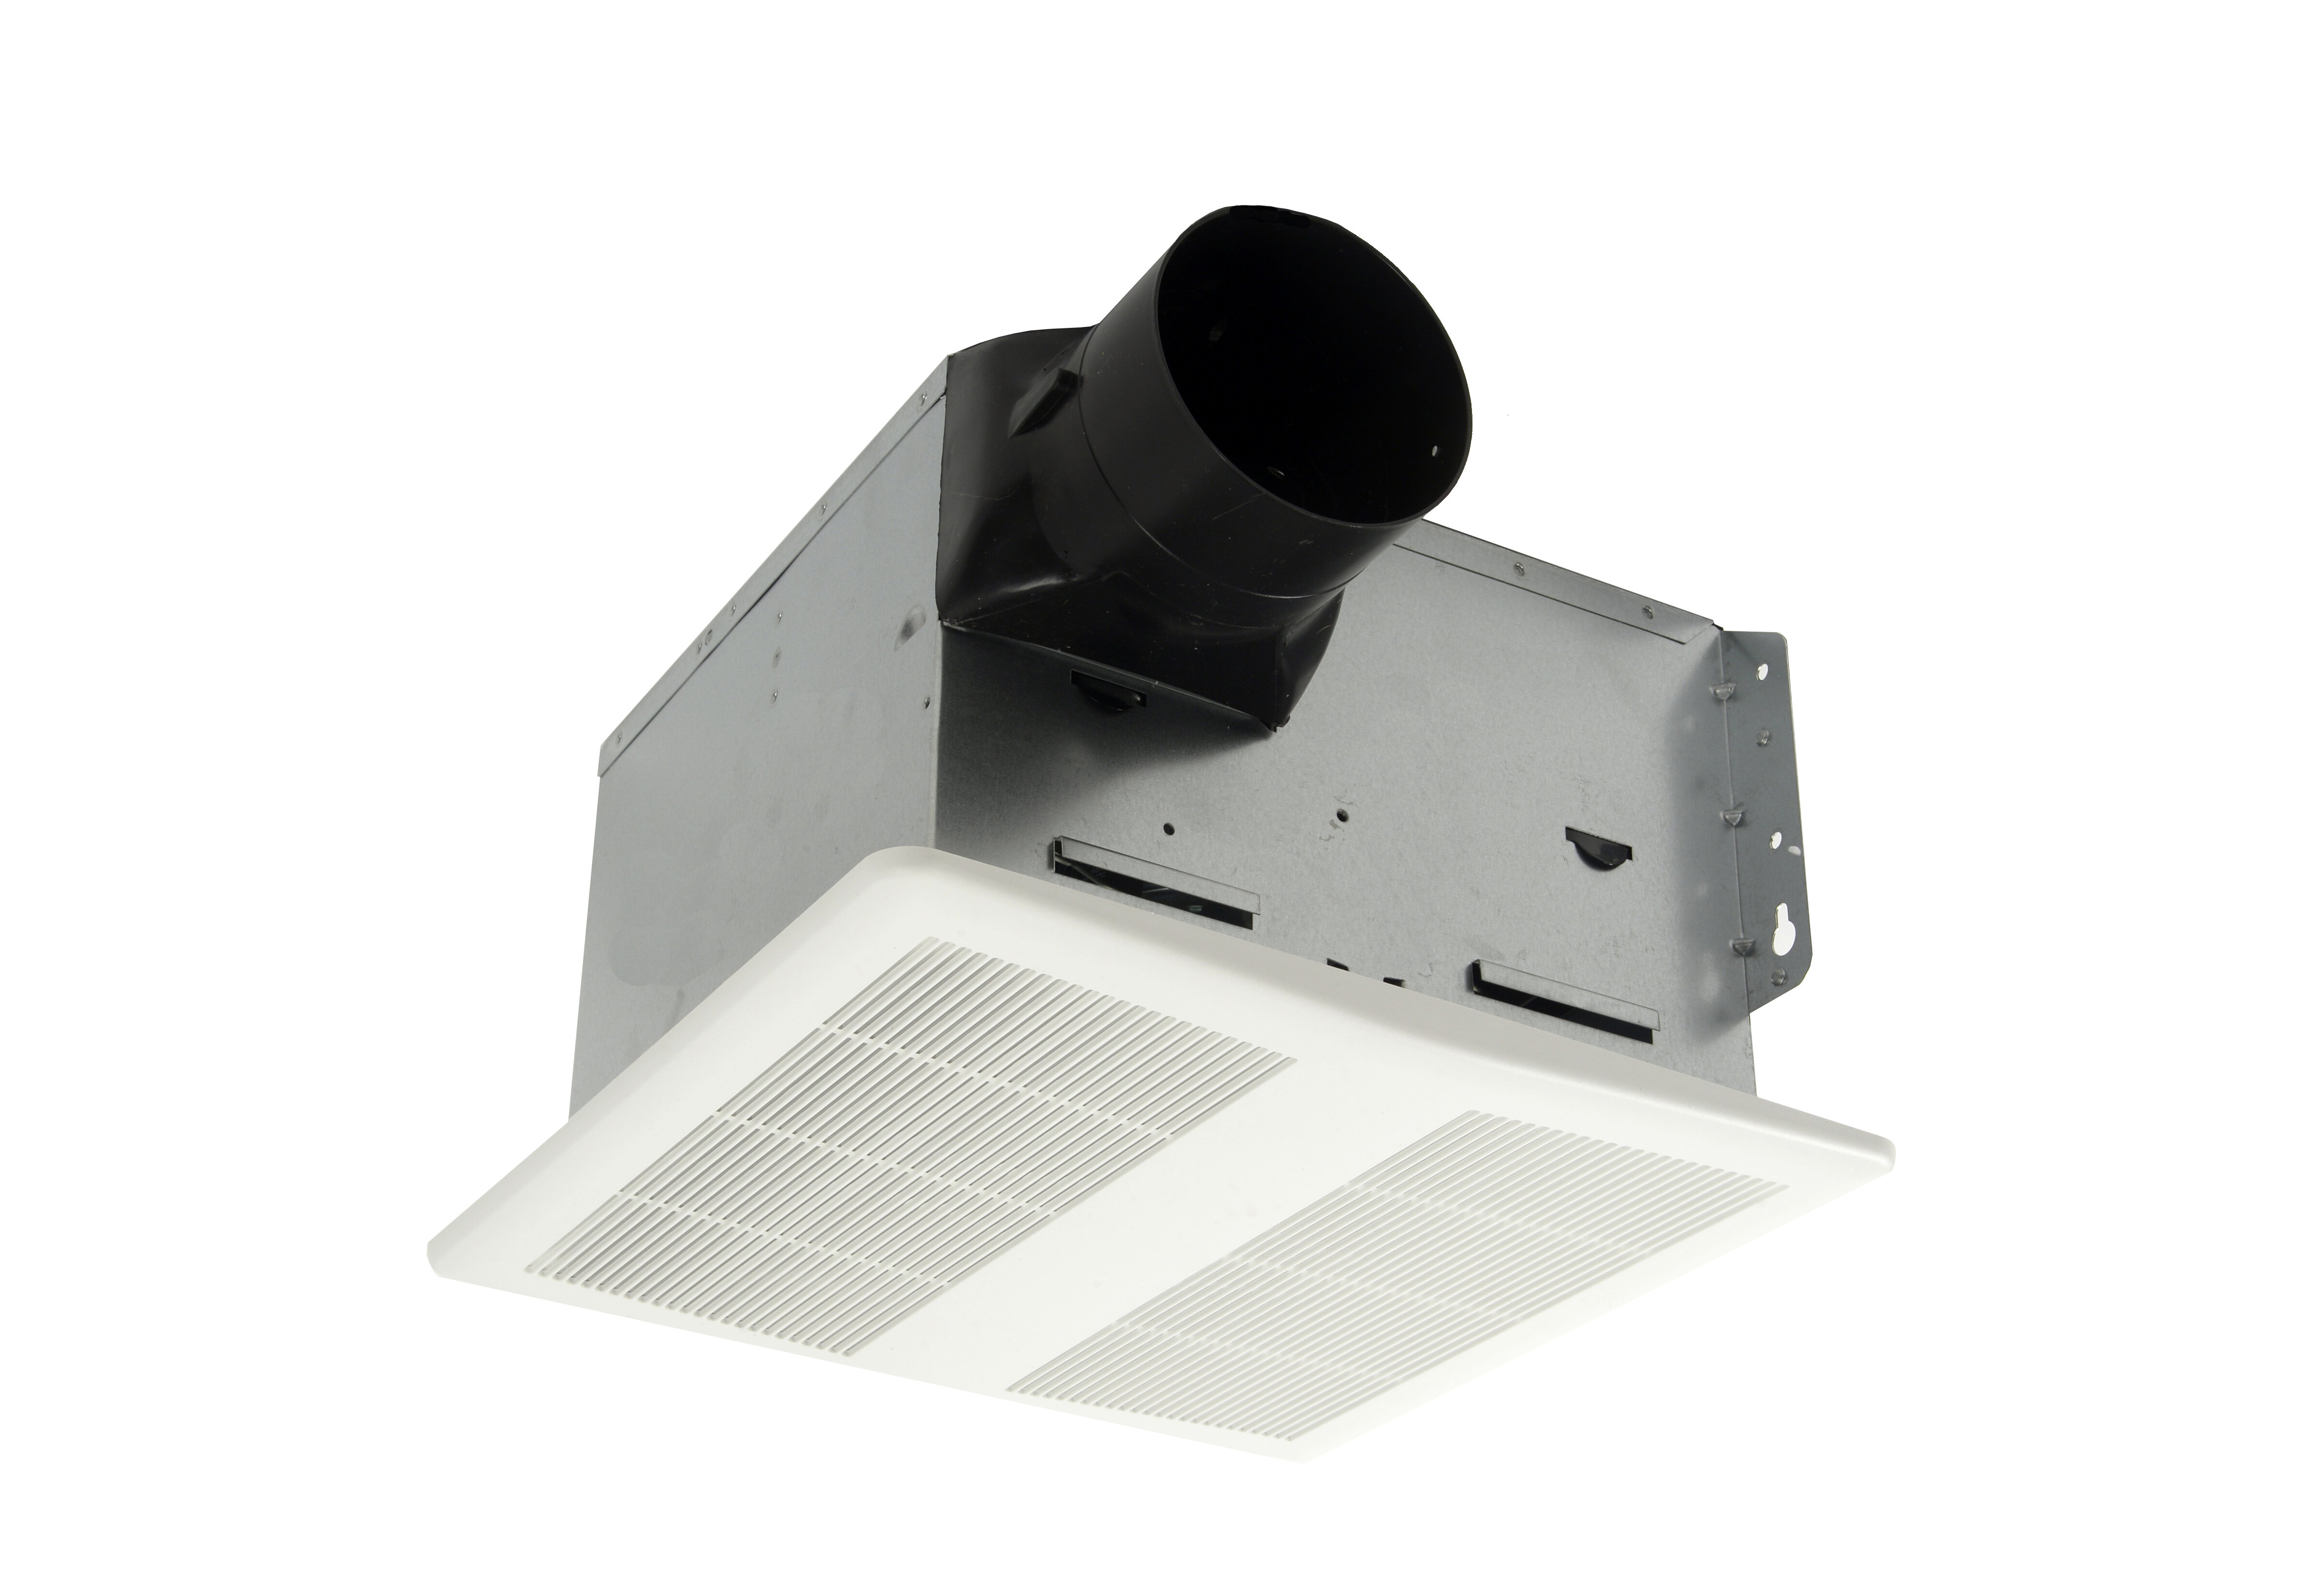 Cyclone Hushtone 150 Cfm Energy Star Bathroom Fan With Humidistat Combo Wayfair